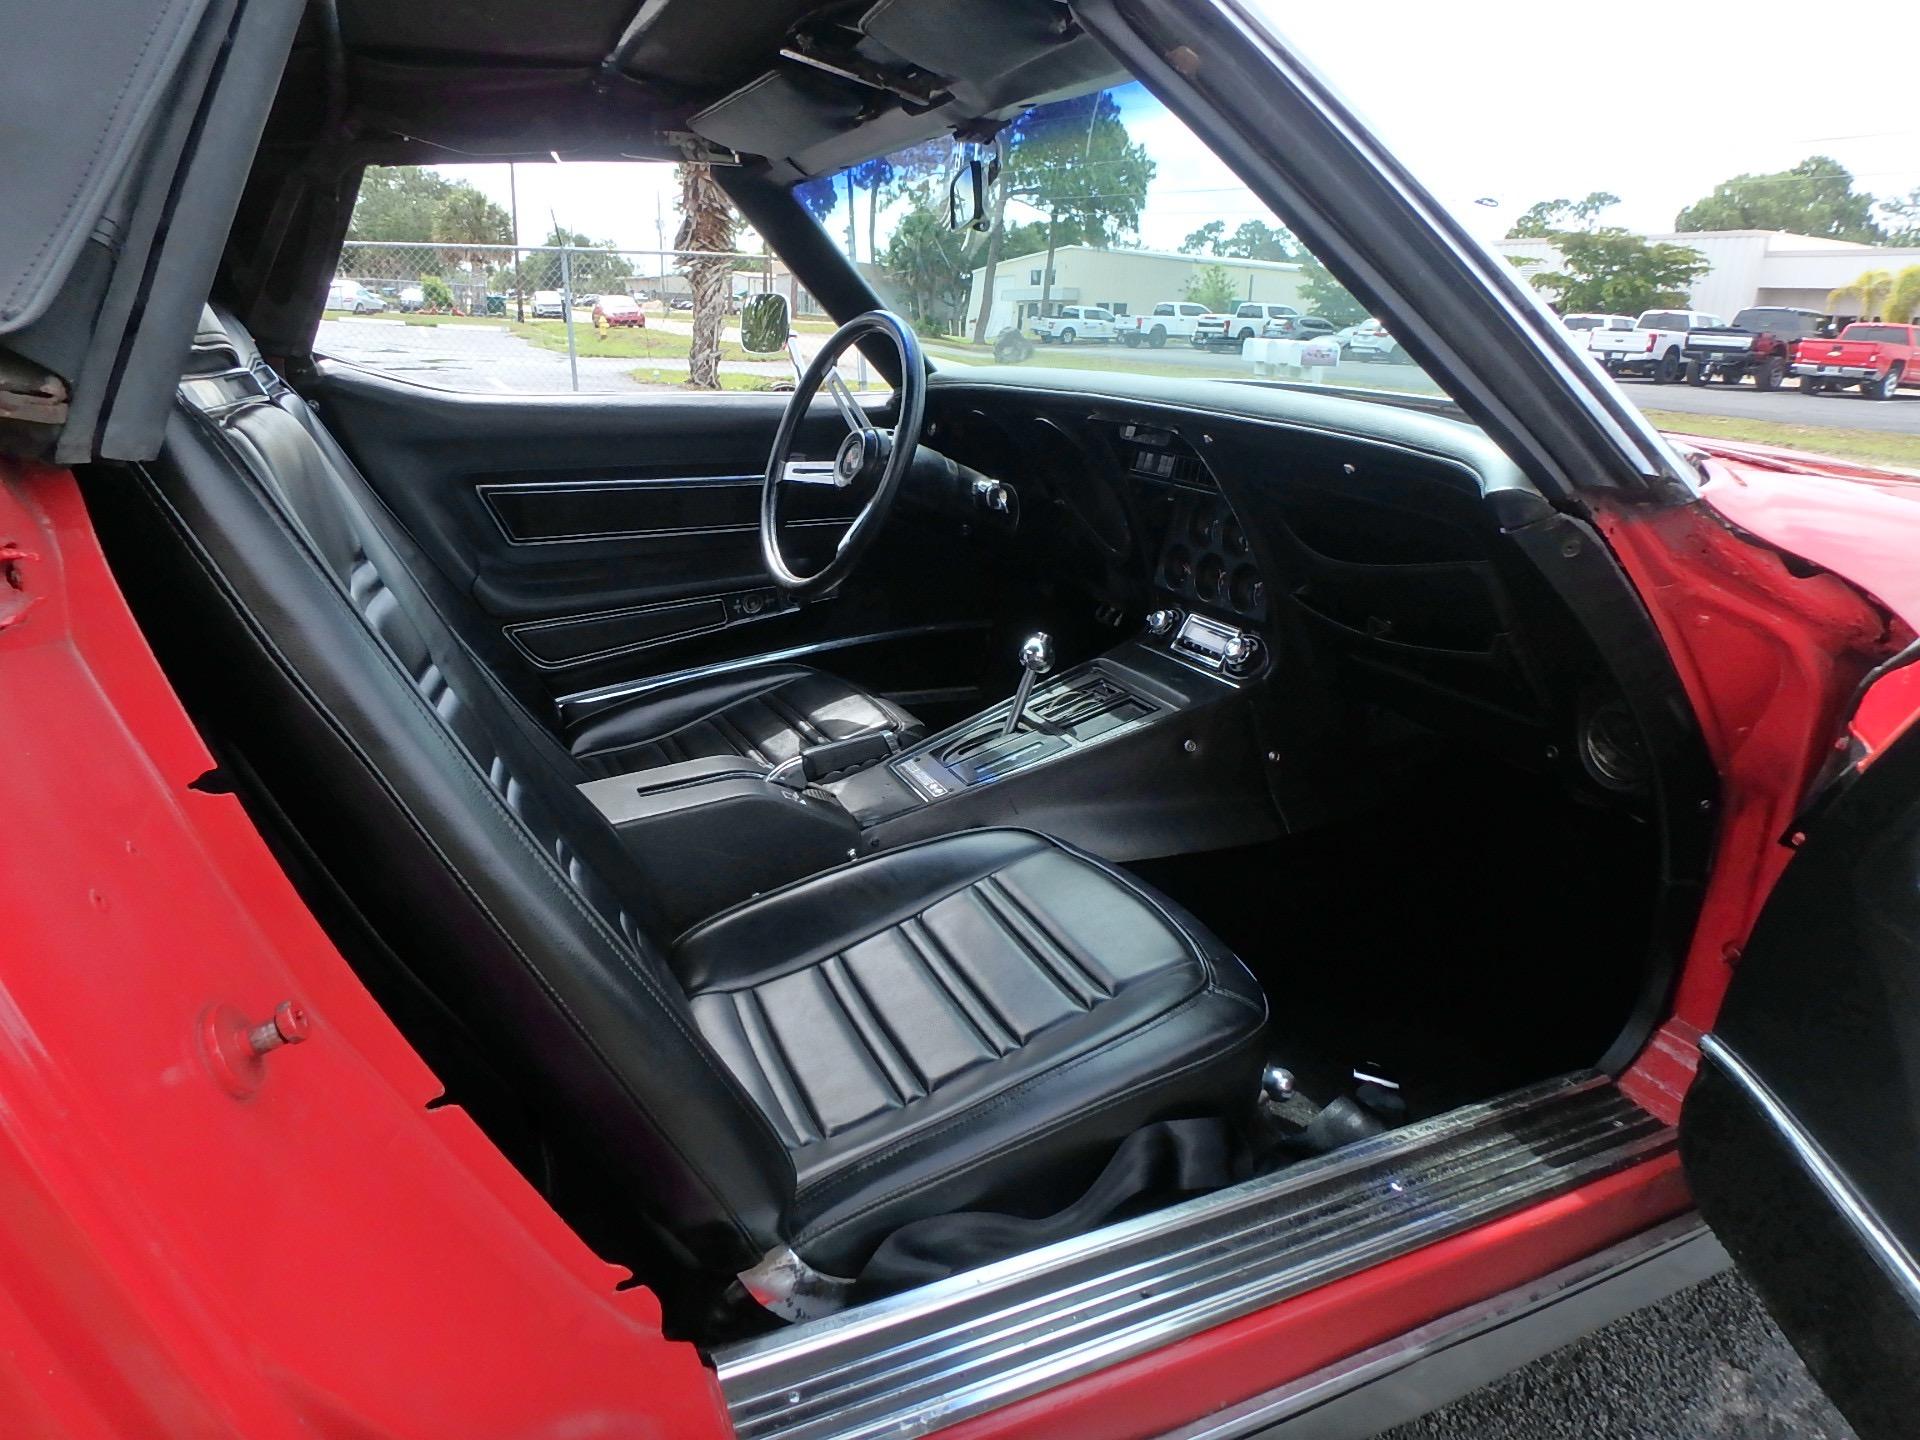 Used 1972 Chevy Corvette Stingray Convertible